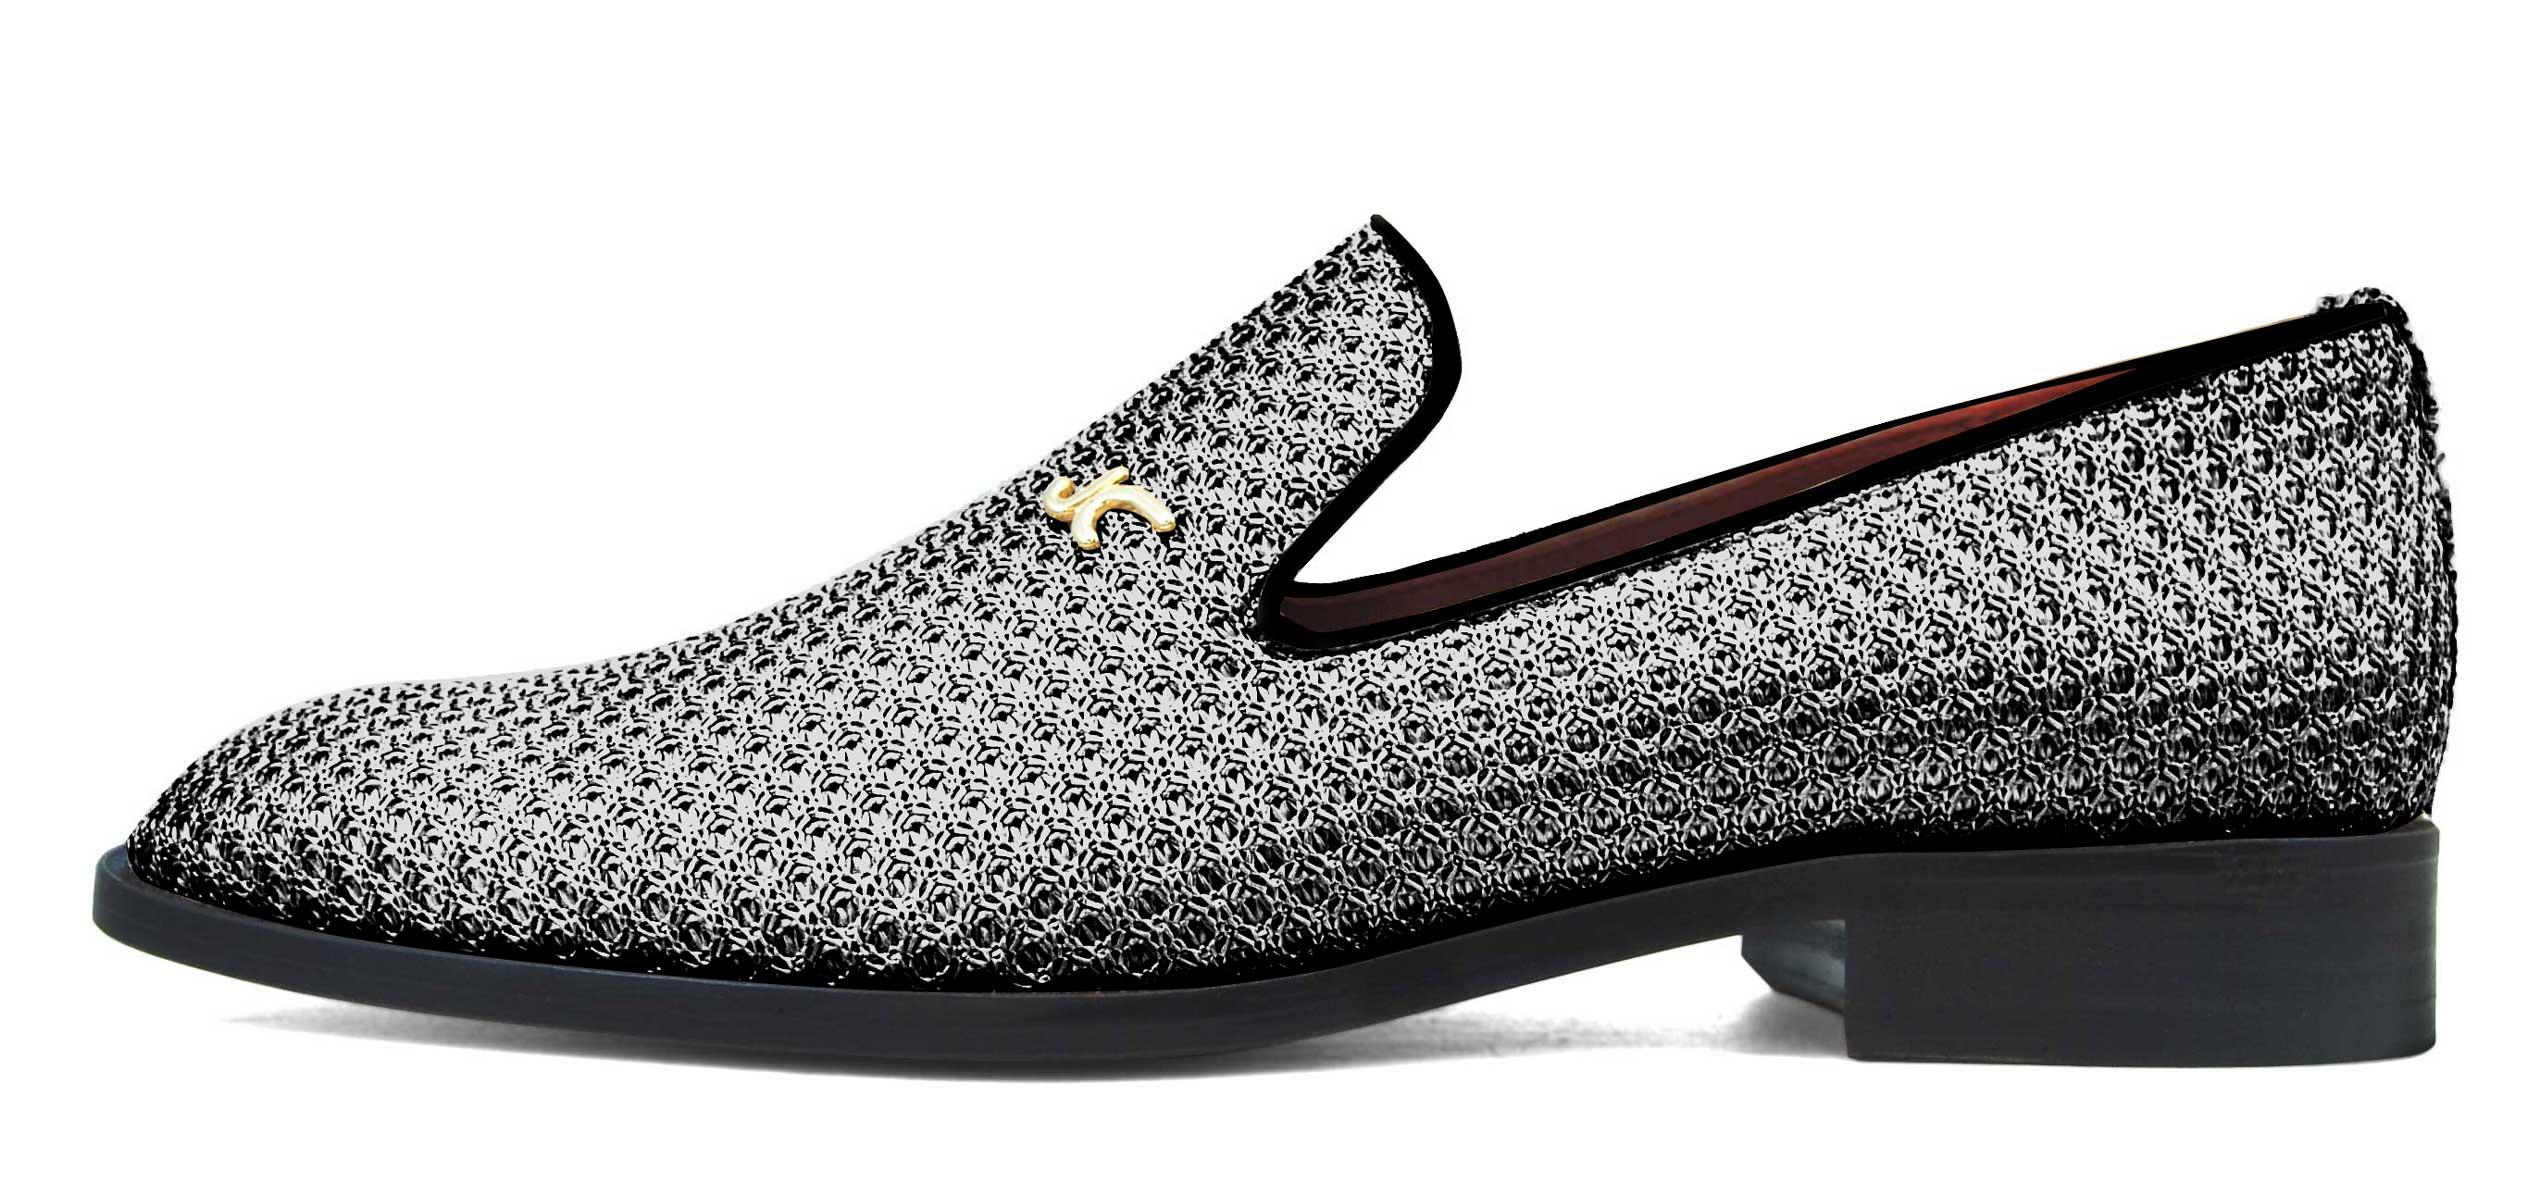 Foto 1 de Zapatos Trenza Seda Plata Negro Con JC Dorado